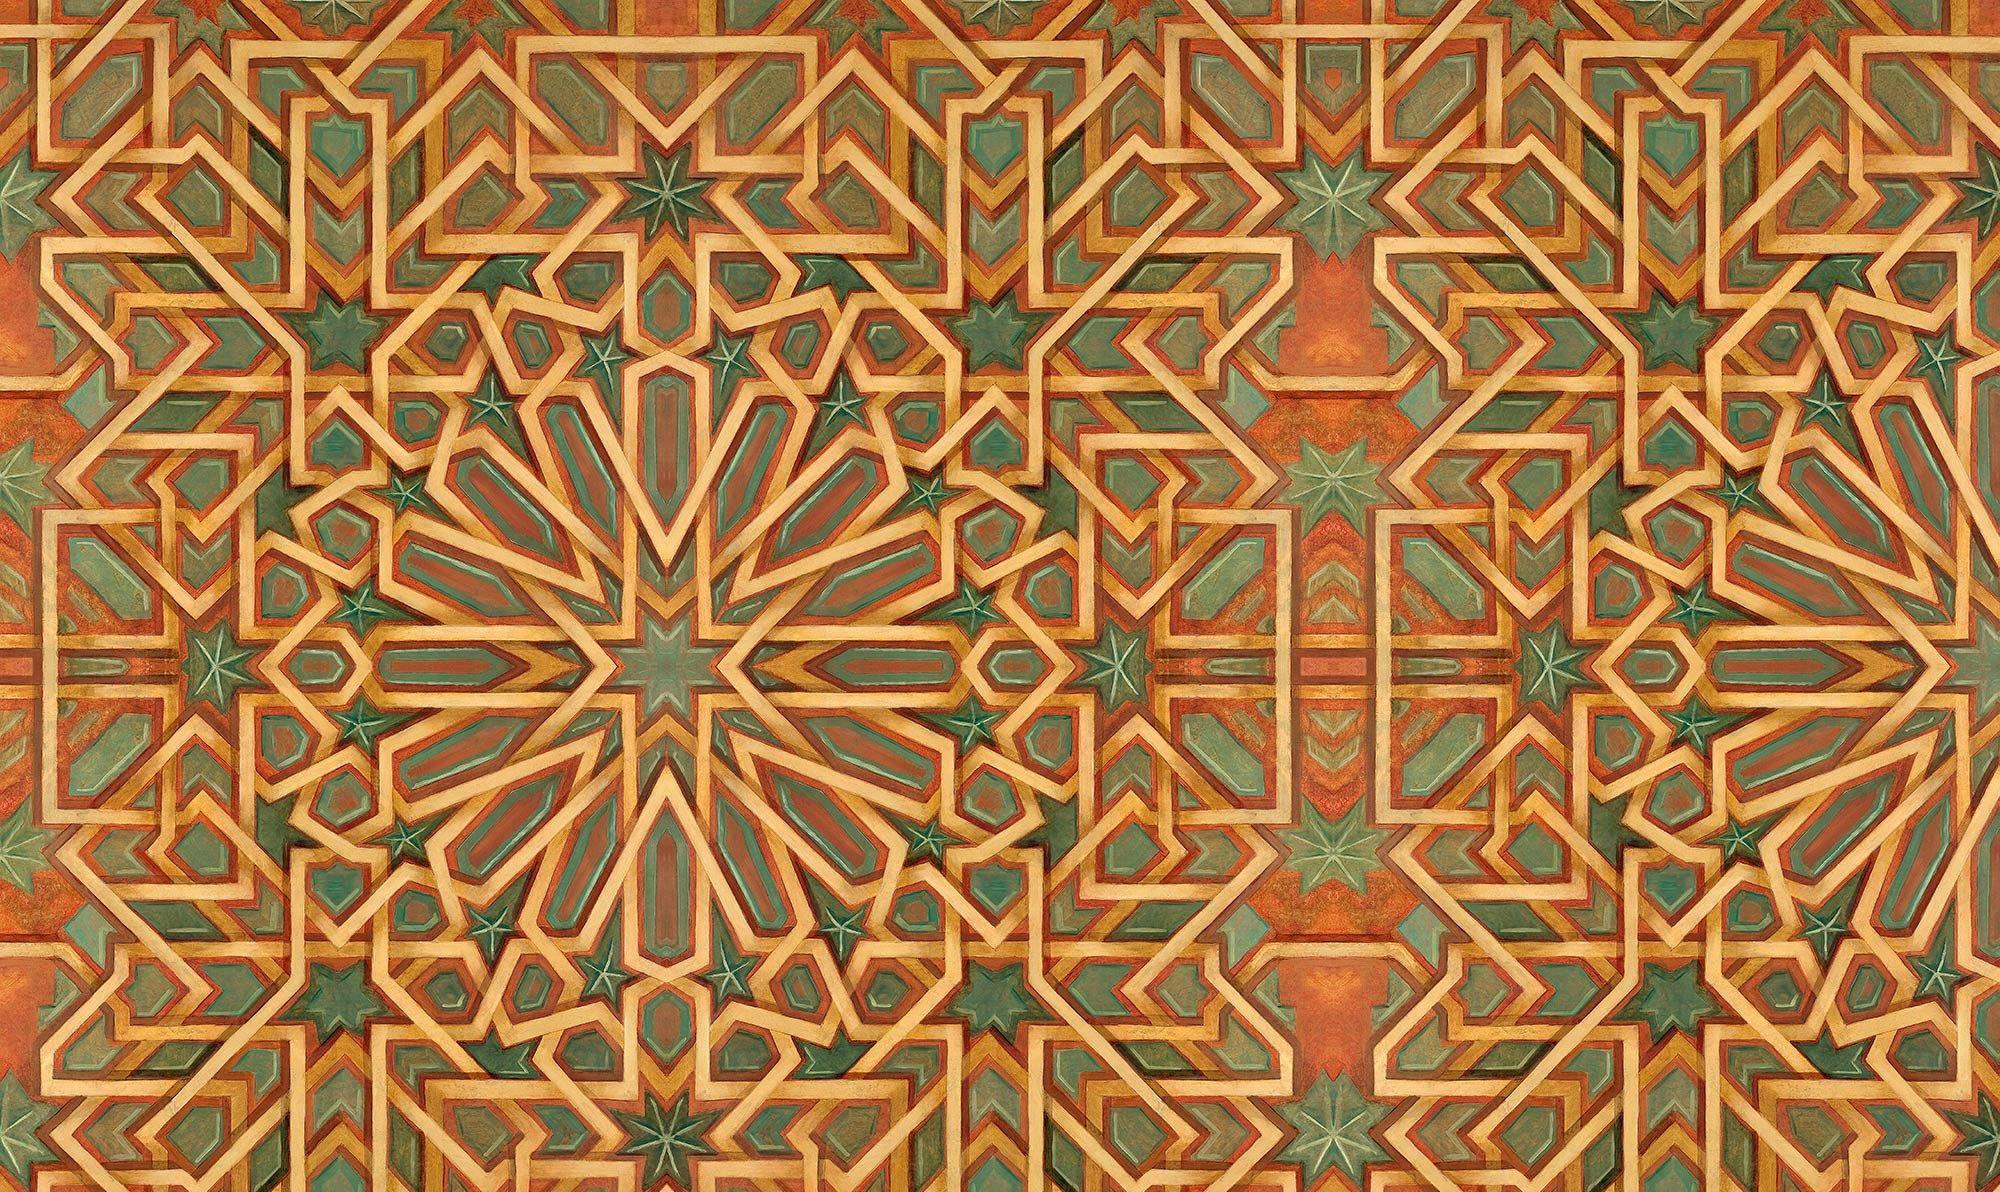 Moroccan Wallpaper By Zoe Design